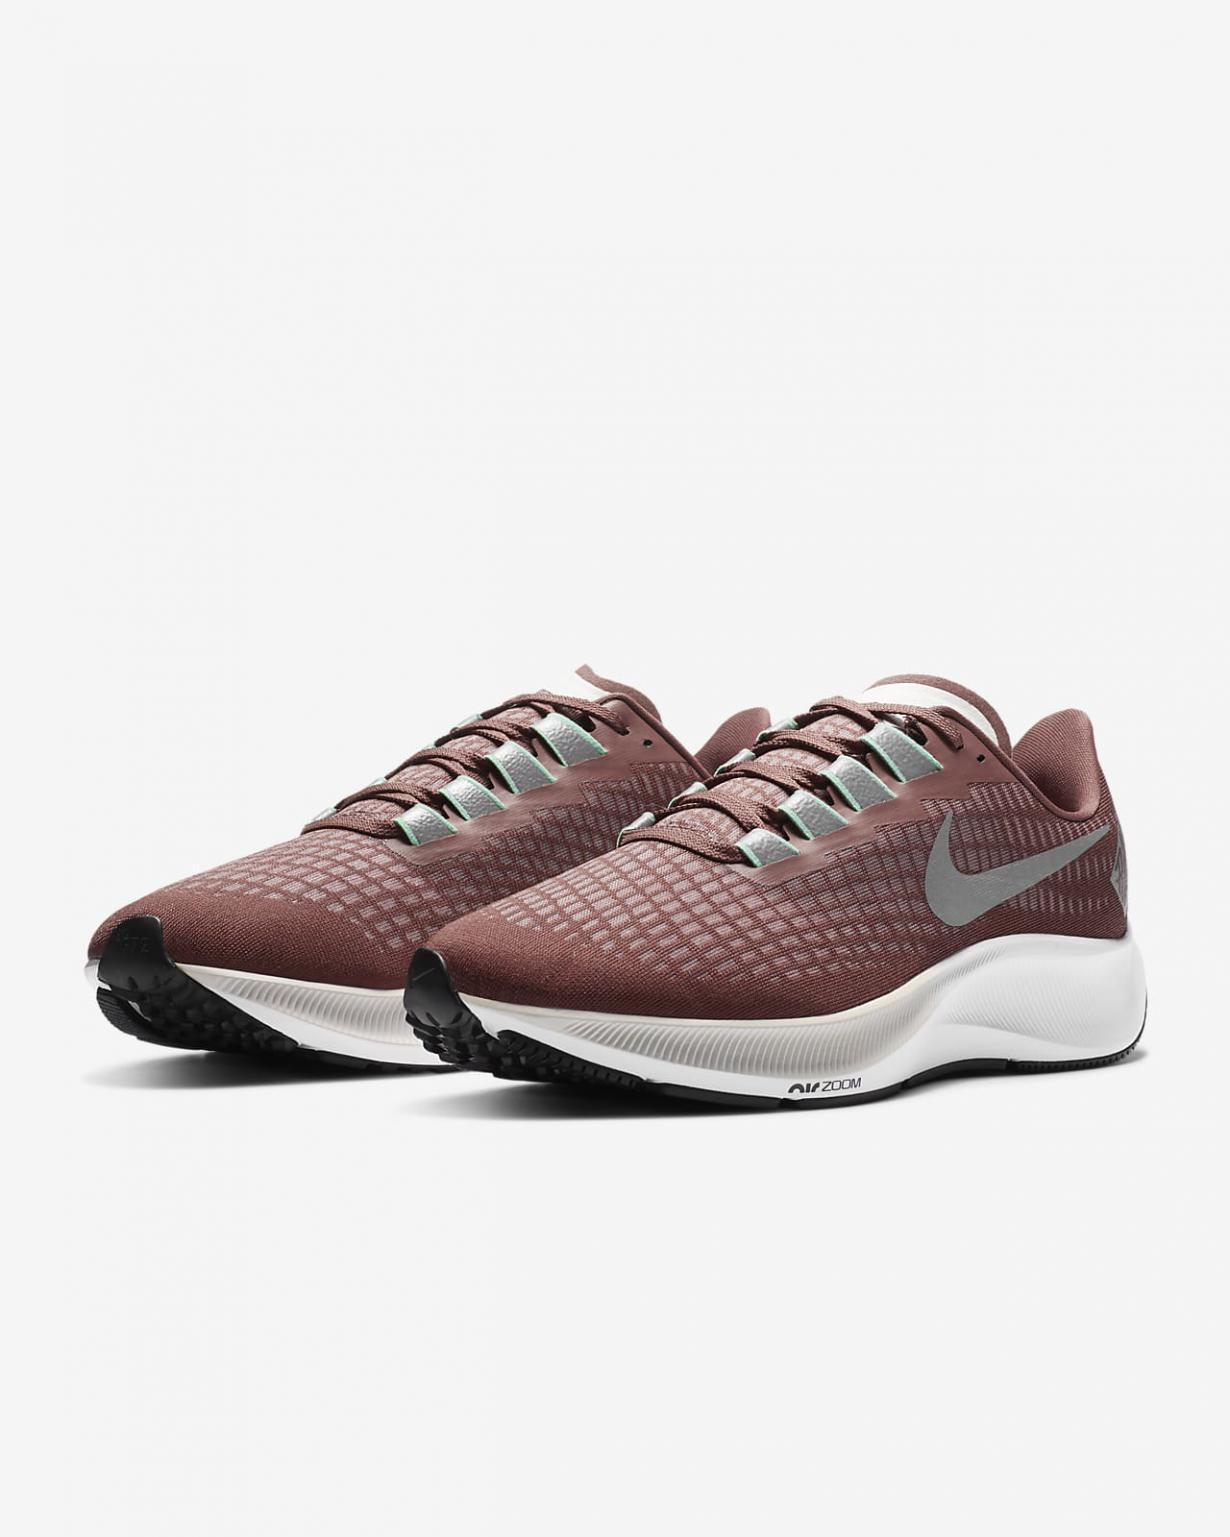 Running Homme   Air Zoom Pegasus 37 Rouge argile/Blanc/Beige clair/Argent réfléchissant   Nike < Gooddaytricities